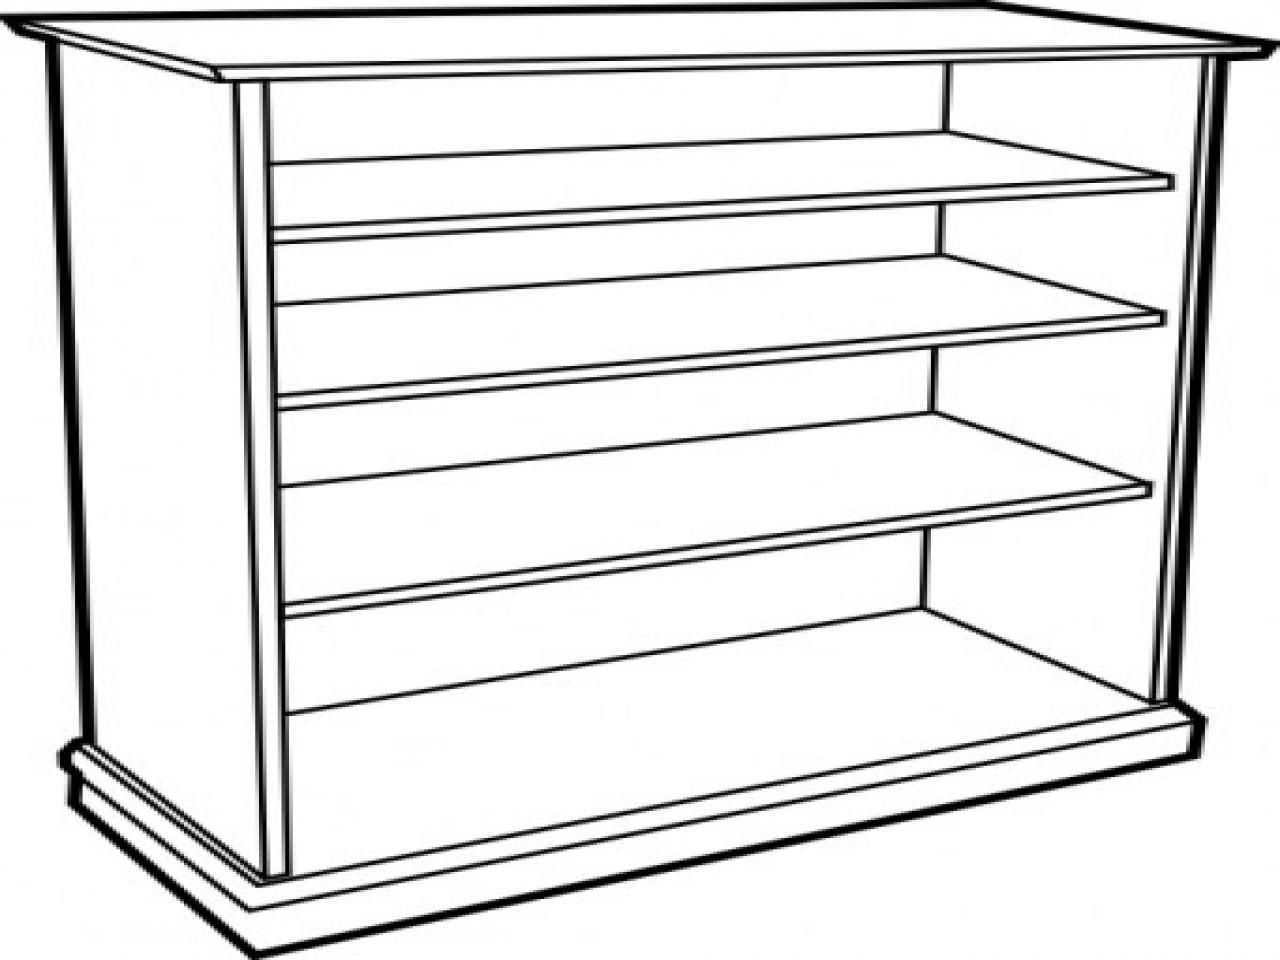 Bookshelf clipart black and white. Free download clip